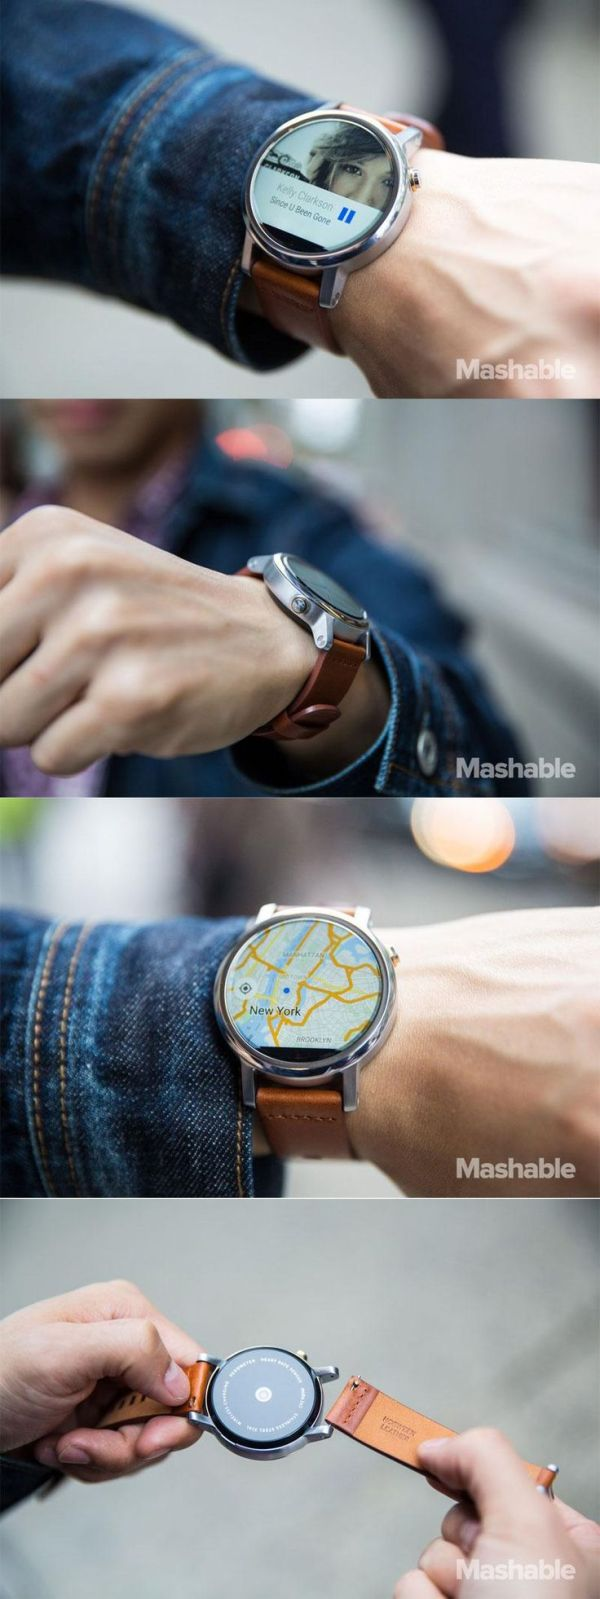 Best 20+ SmartWatch ideas on Pinterest | Fossil gold watch ...